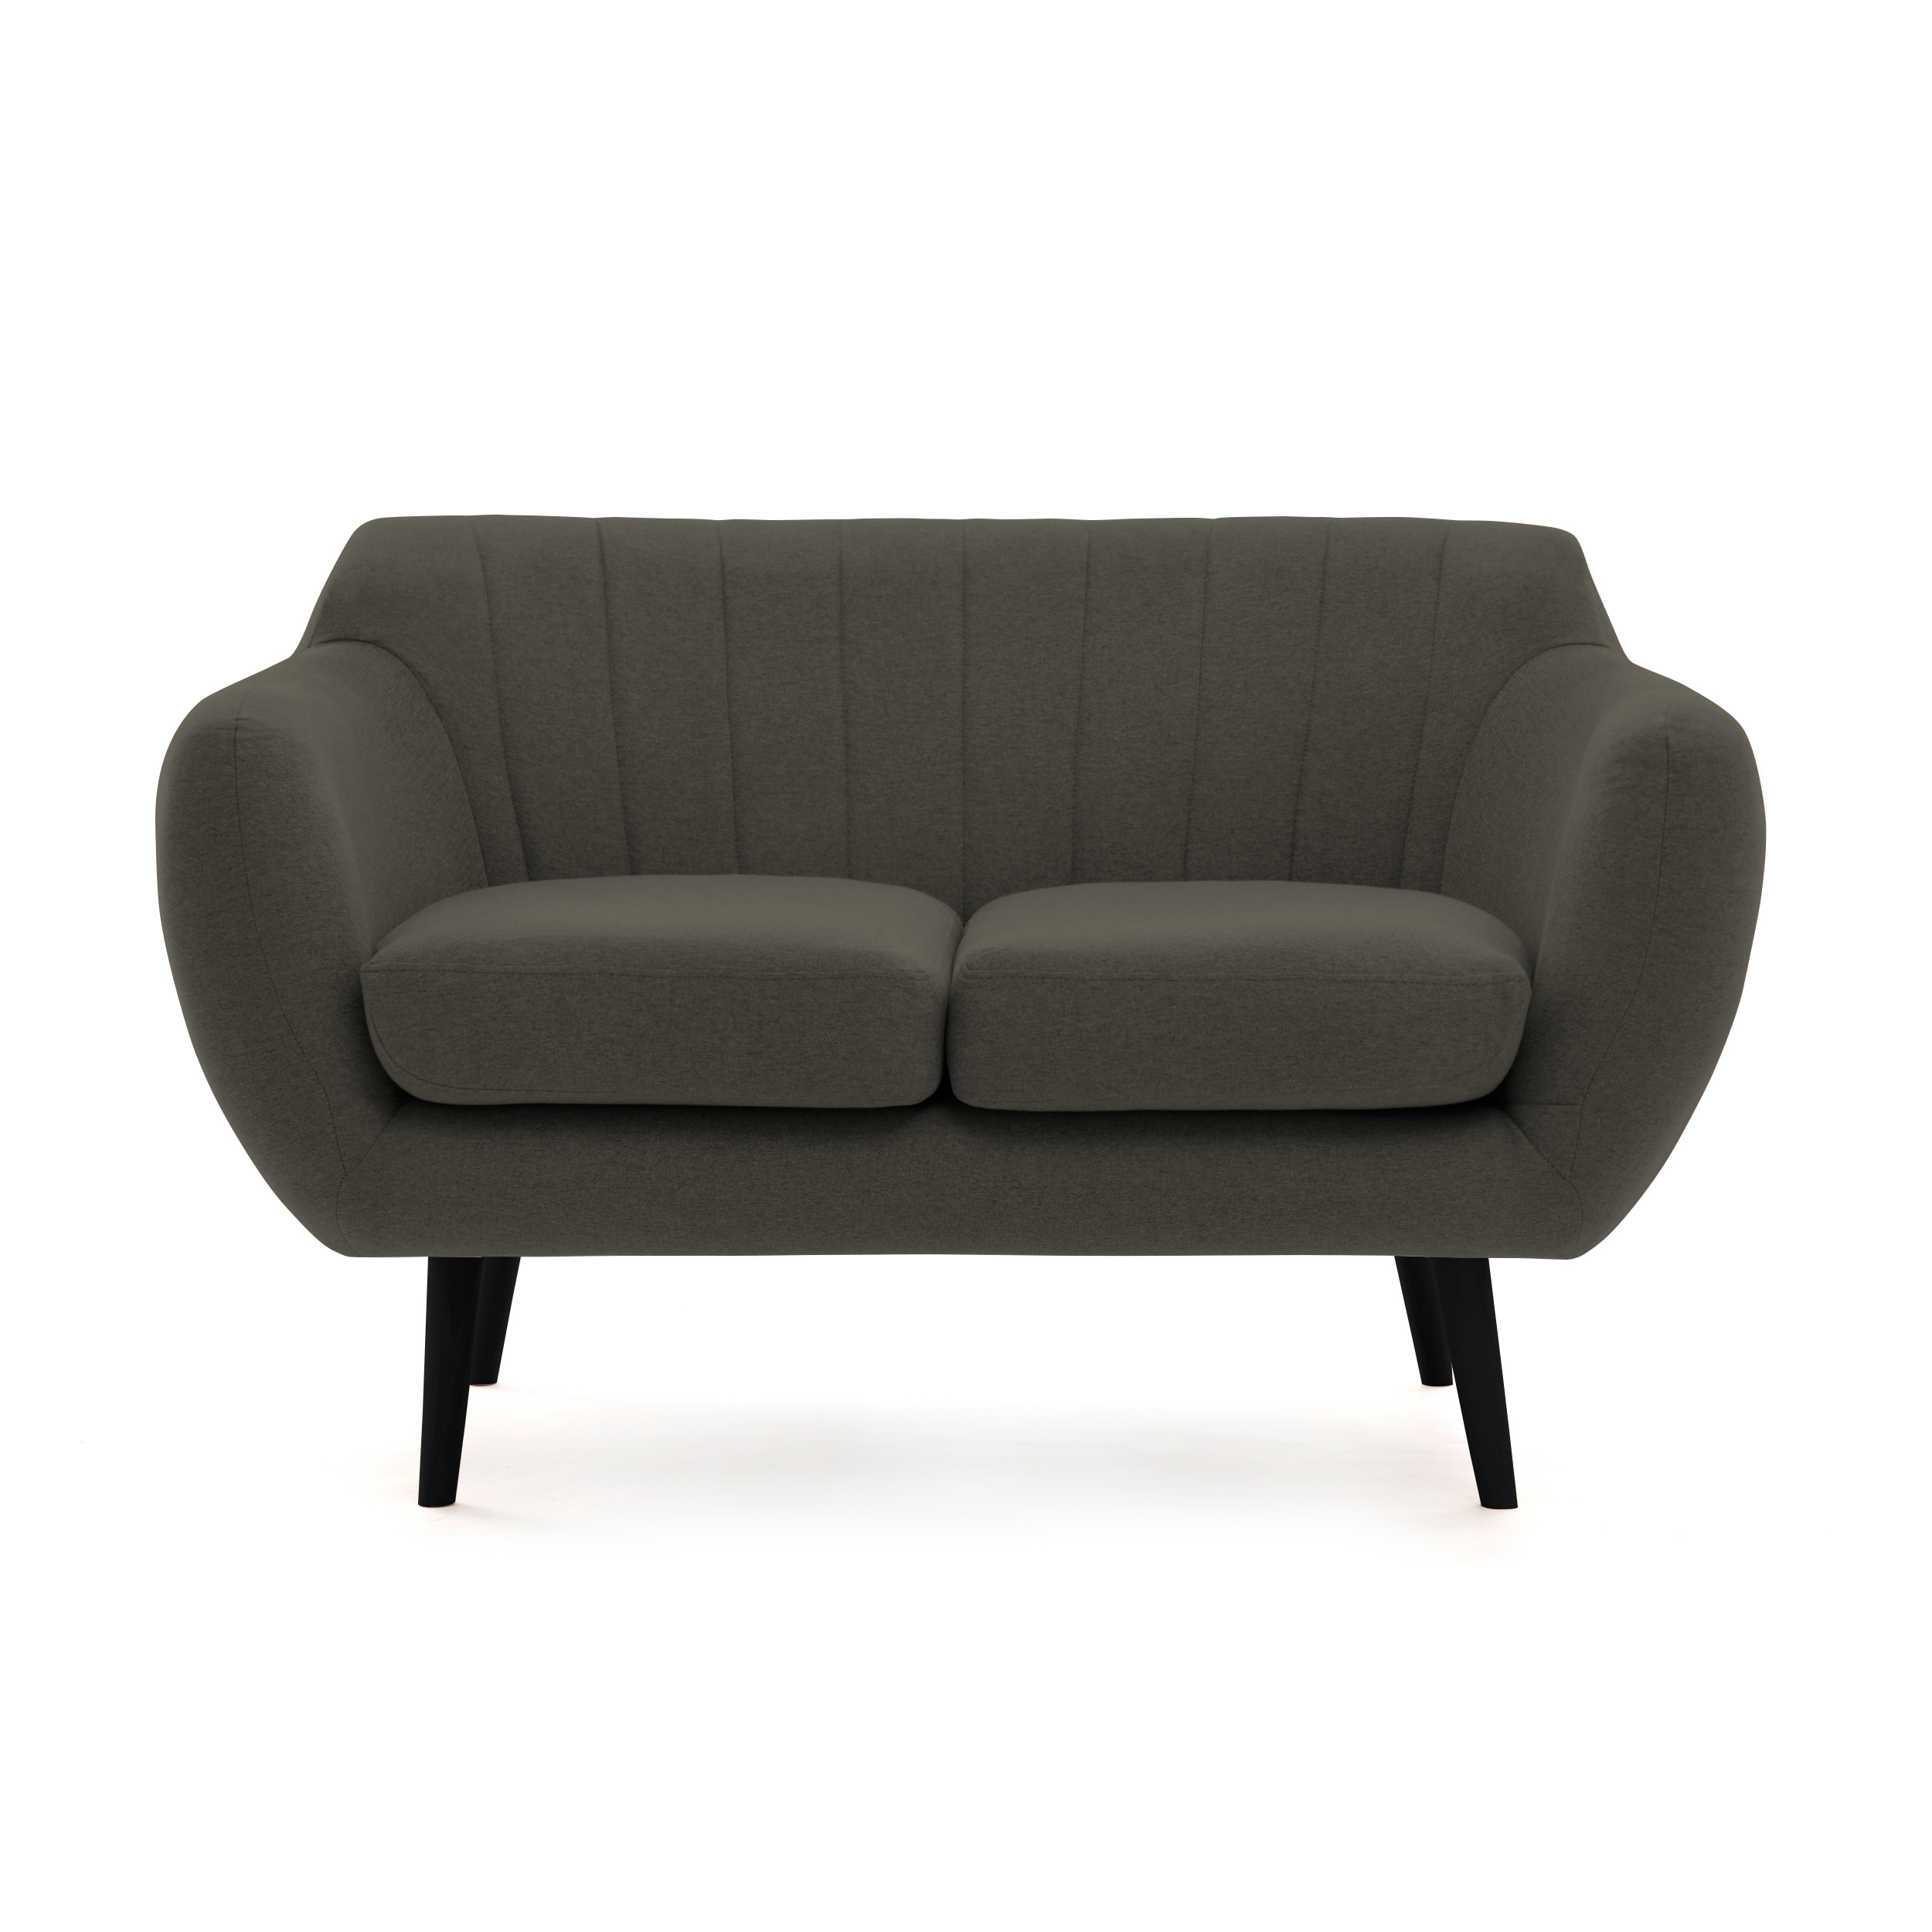 Canapea Fixa 2 Locuri Kennet Dark Grey Ii